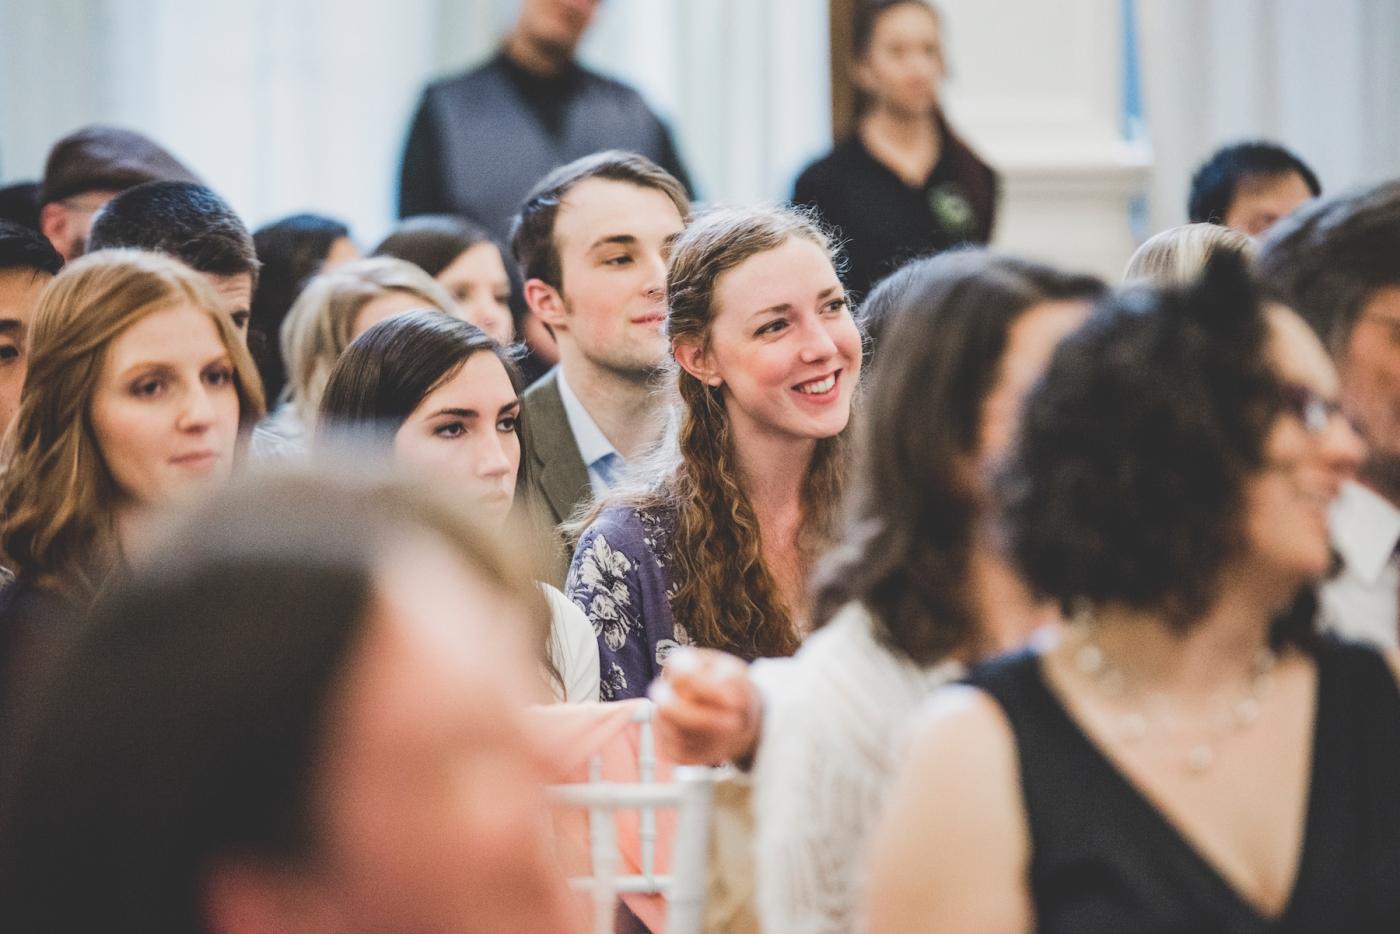 DSC_2638Everett_Wedding_Ballroom_Jane_Speleers_photography_Rachel_and_Edmund_Ceremony_2017